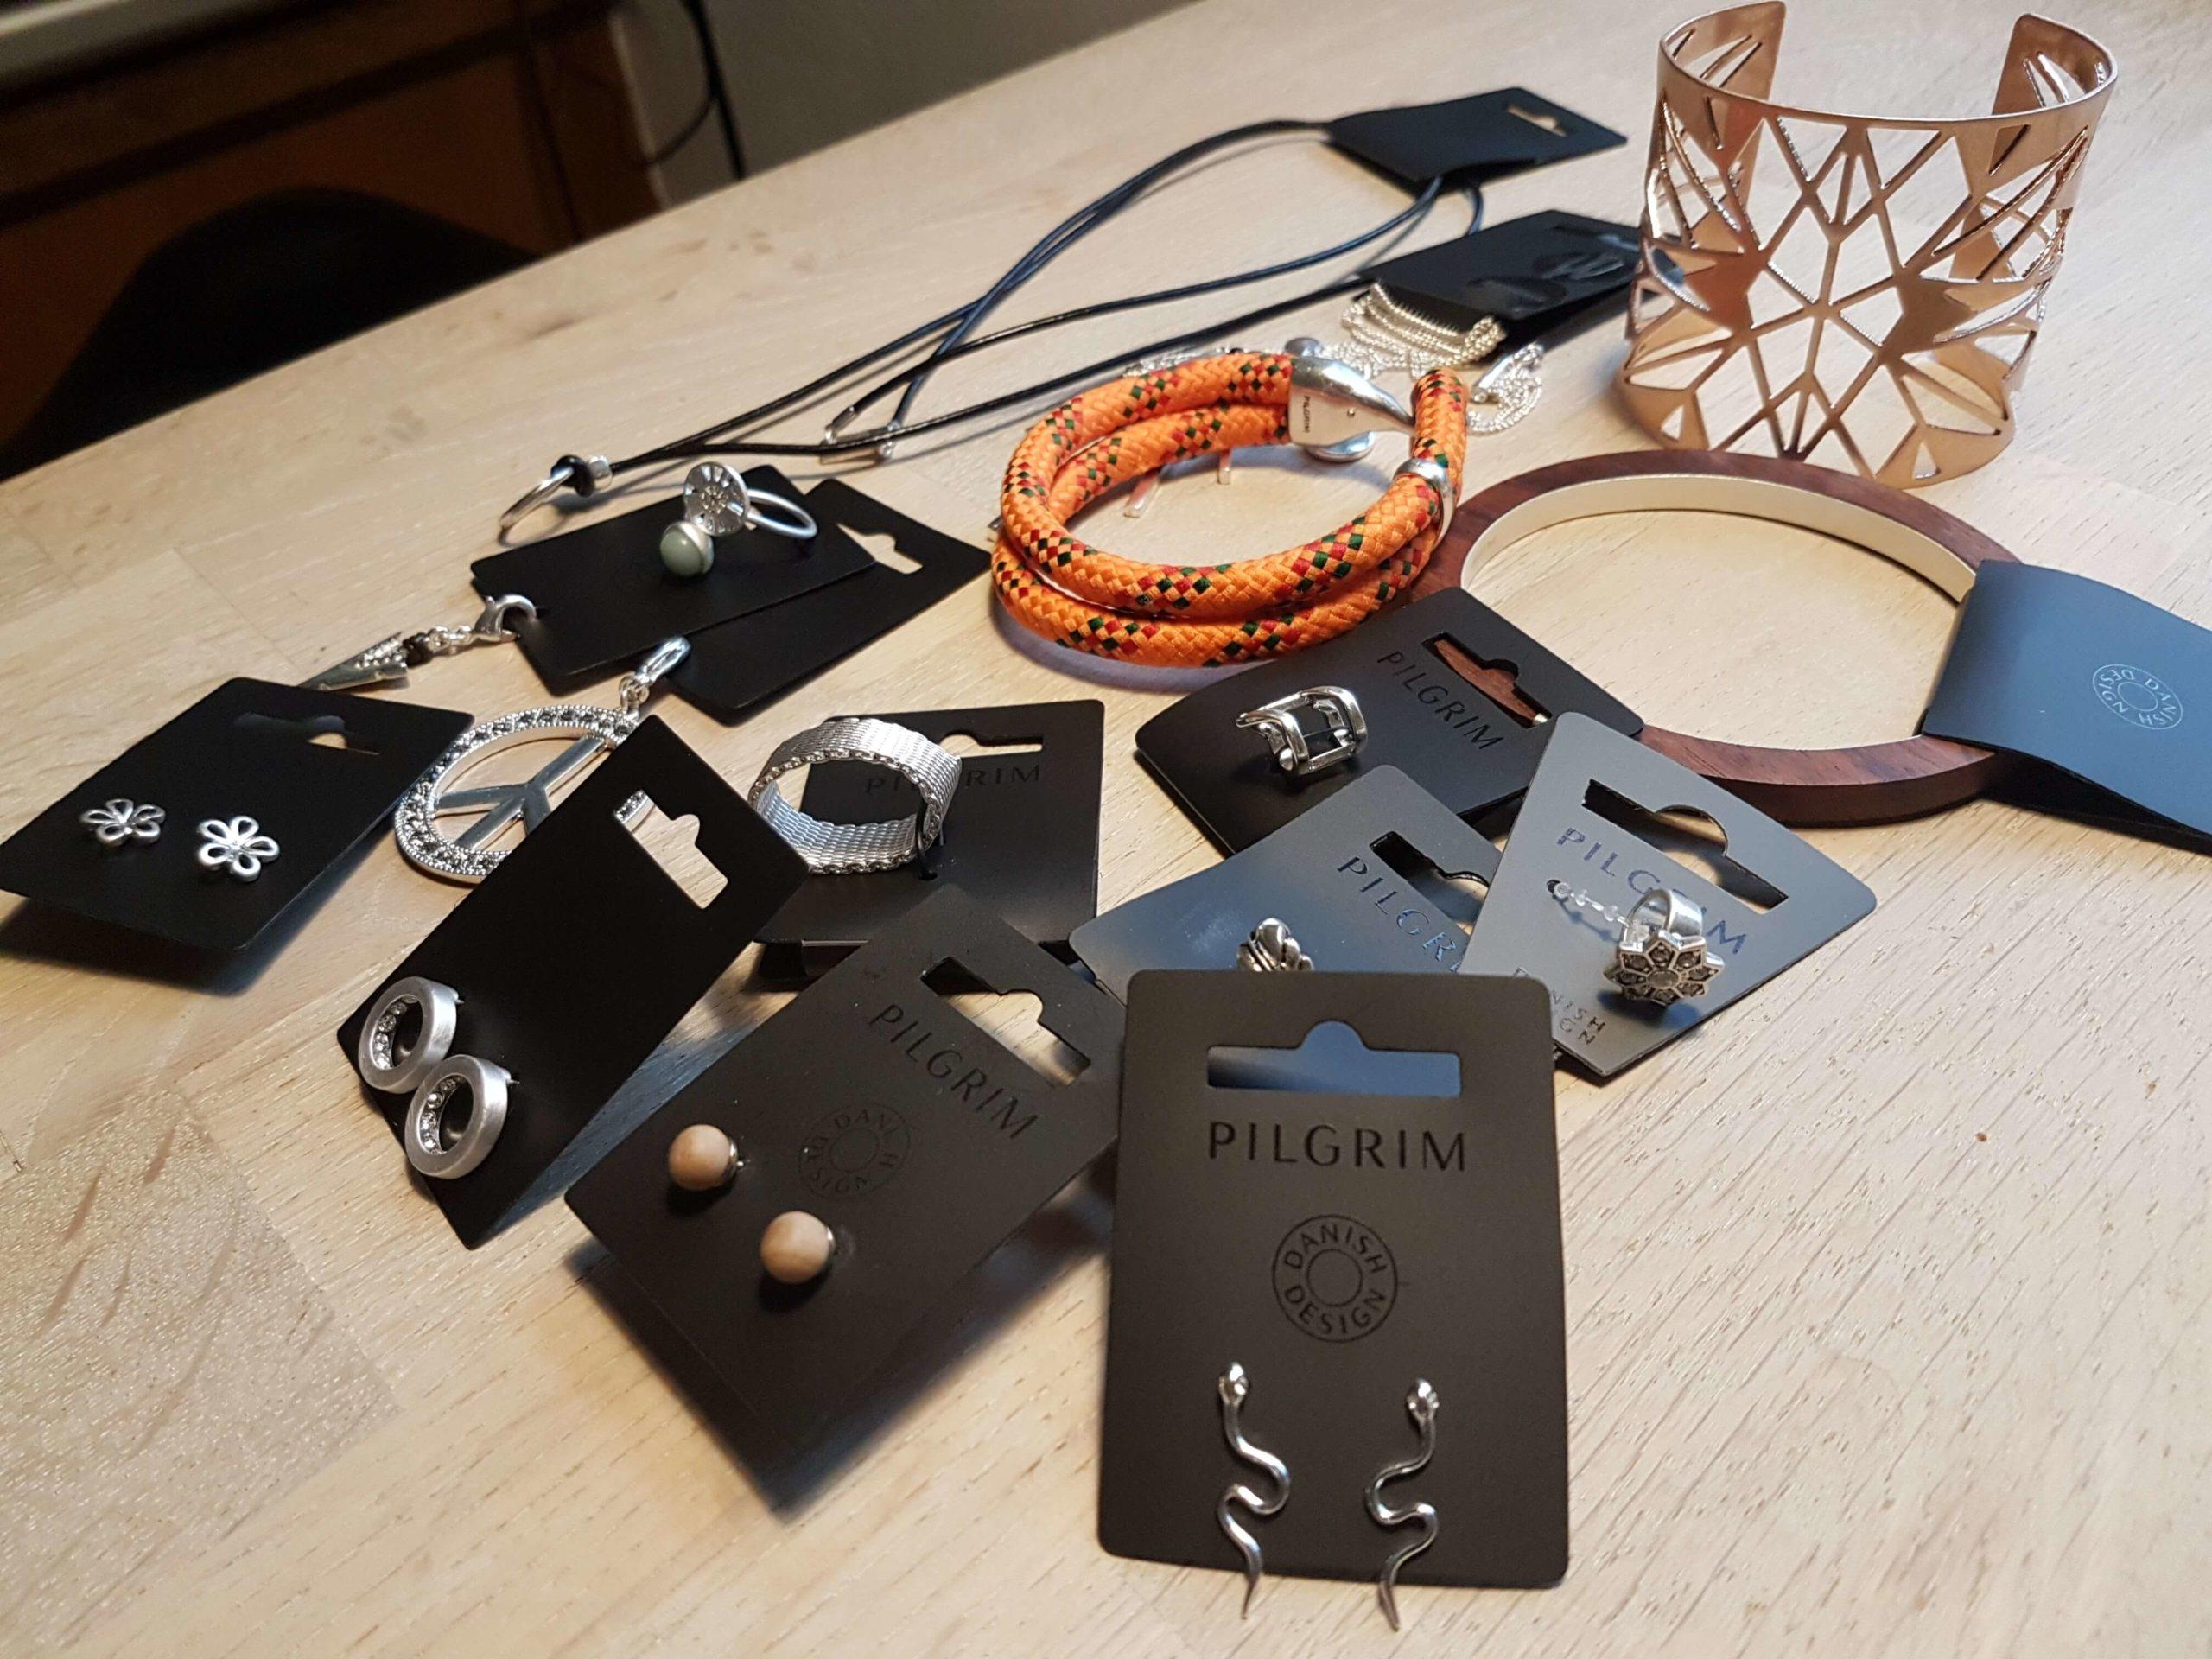 accessories lagersalg pilgrim kapsel garderobe capsule wardrobe